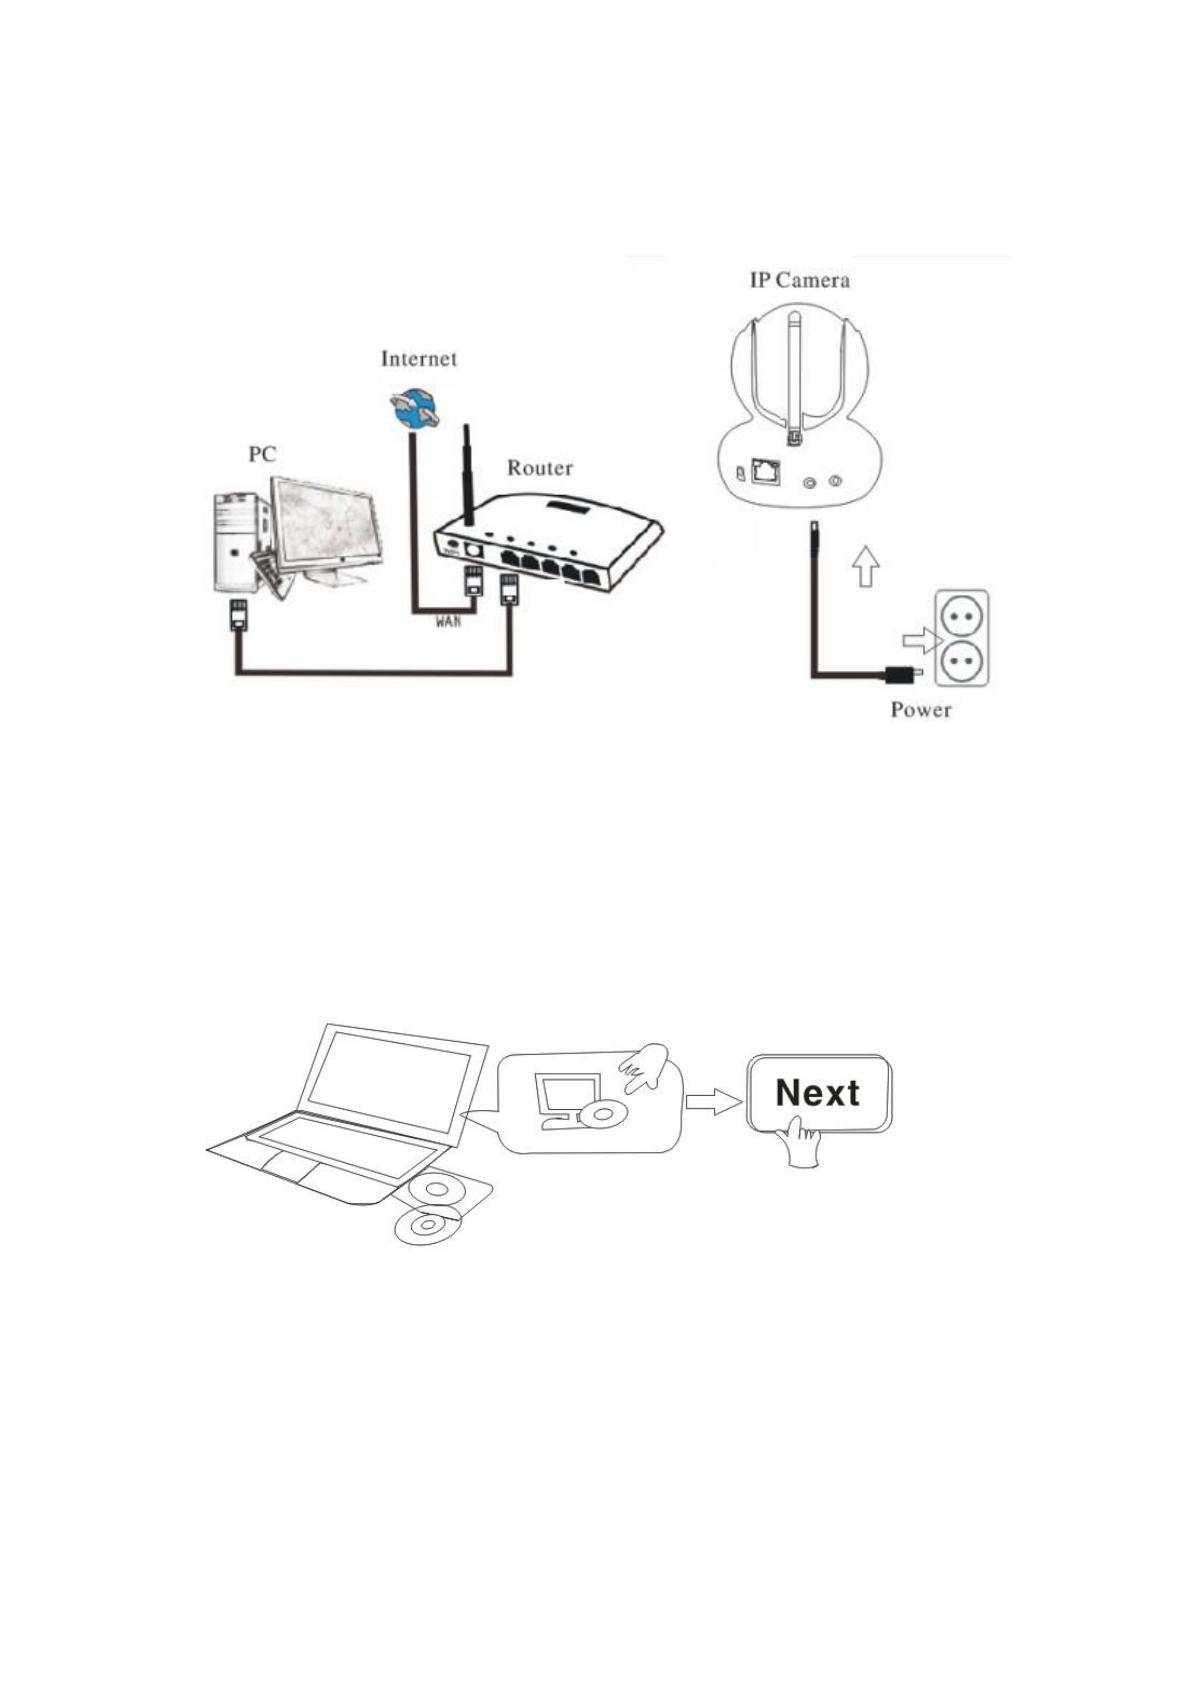 Wanscam Technology HW0036 IP Camera User Manual